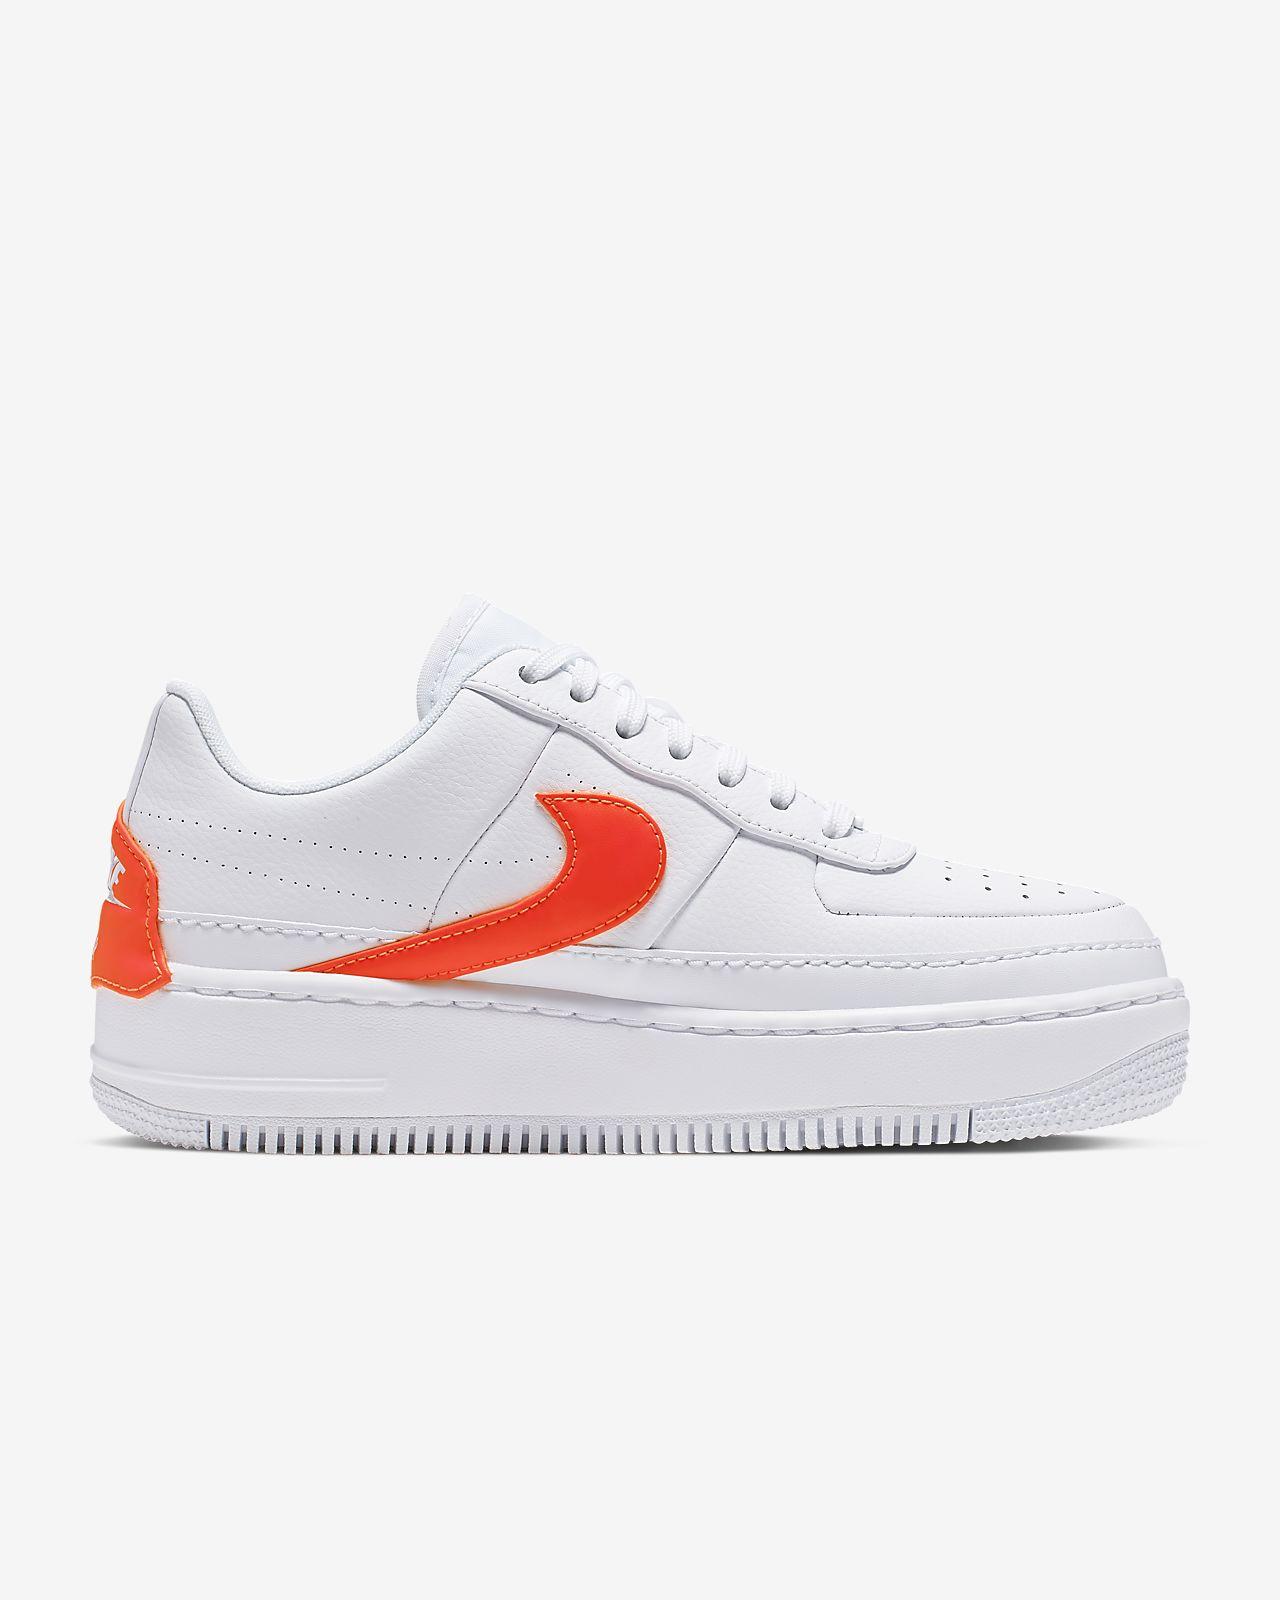 Nike Force Xx Jester Shoe Women's 1 Air kZuOXTiP